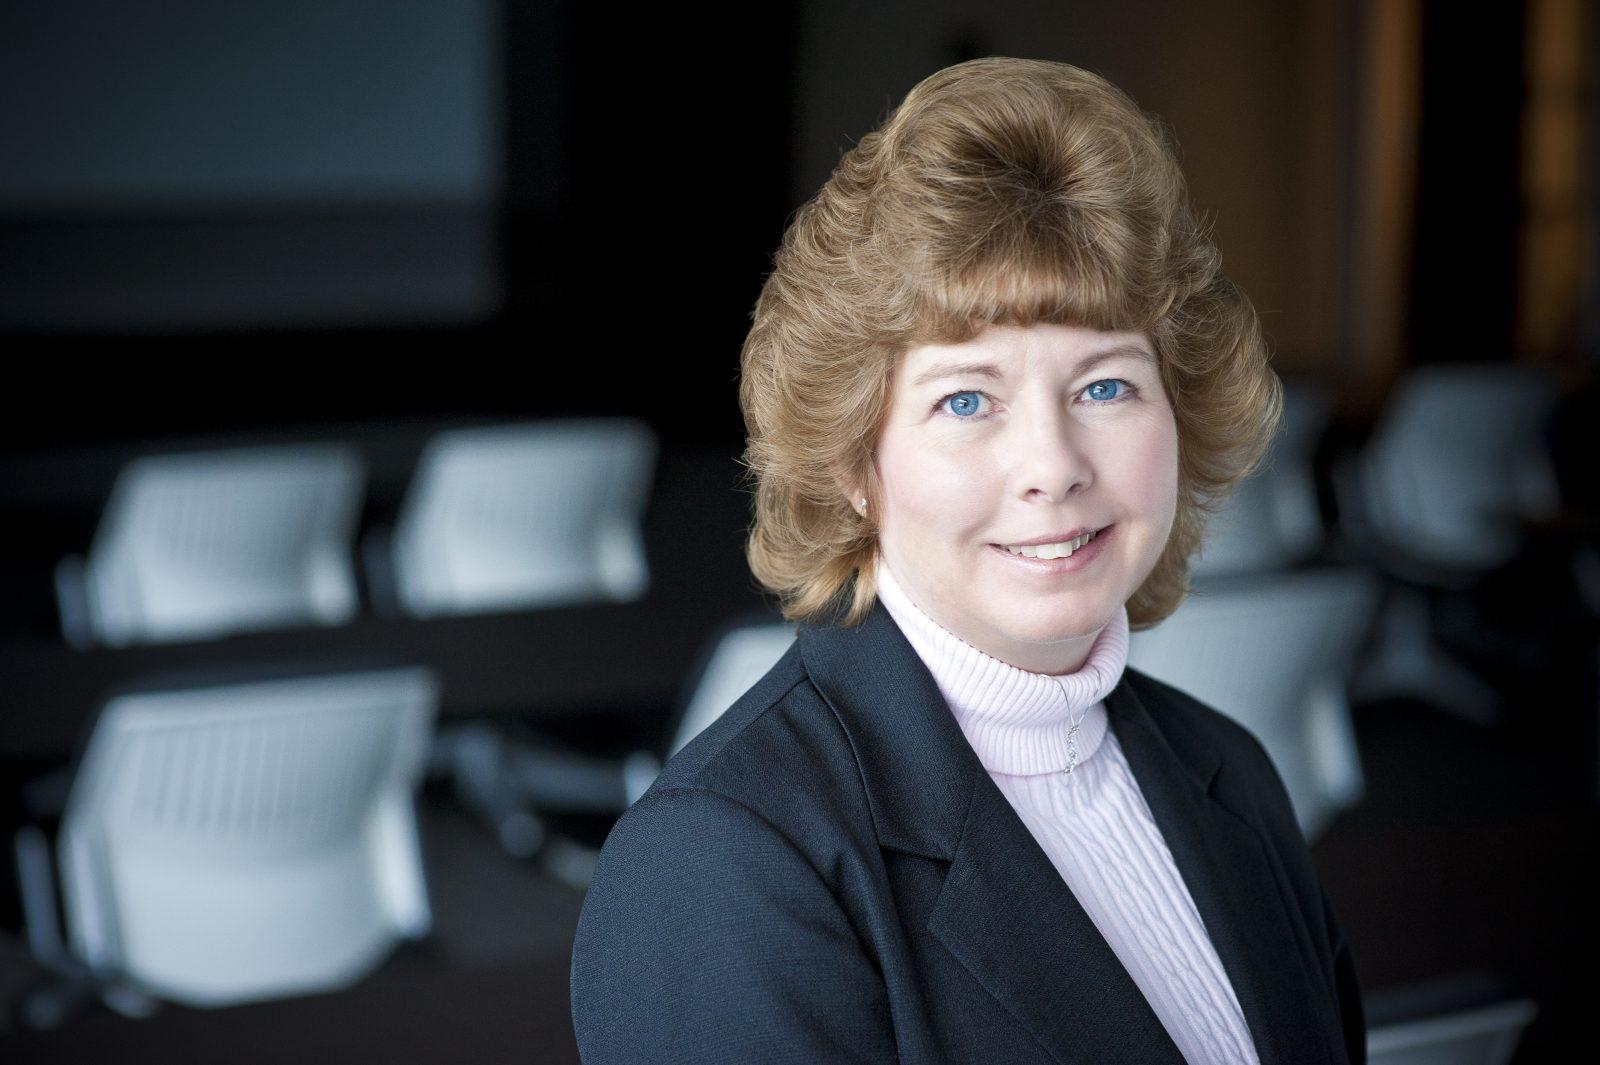 Lisa Lutz